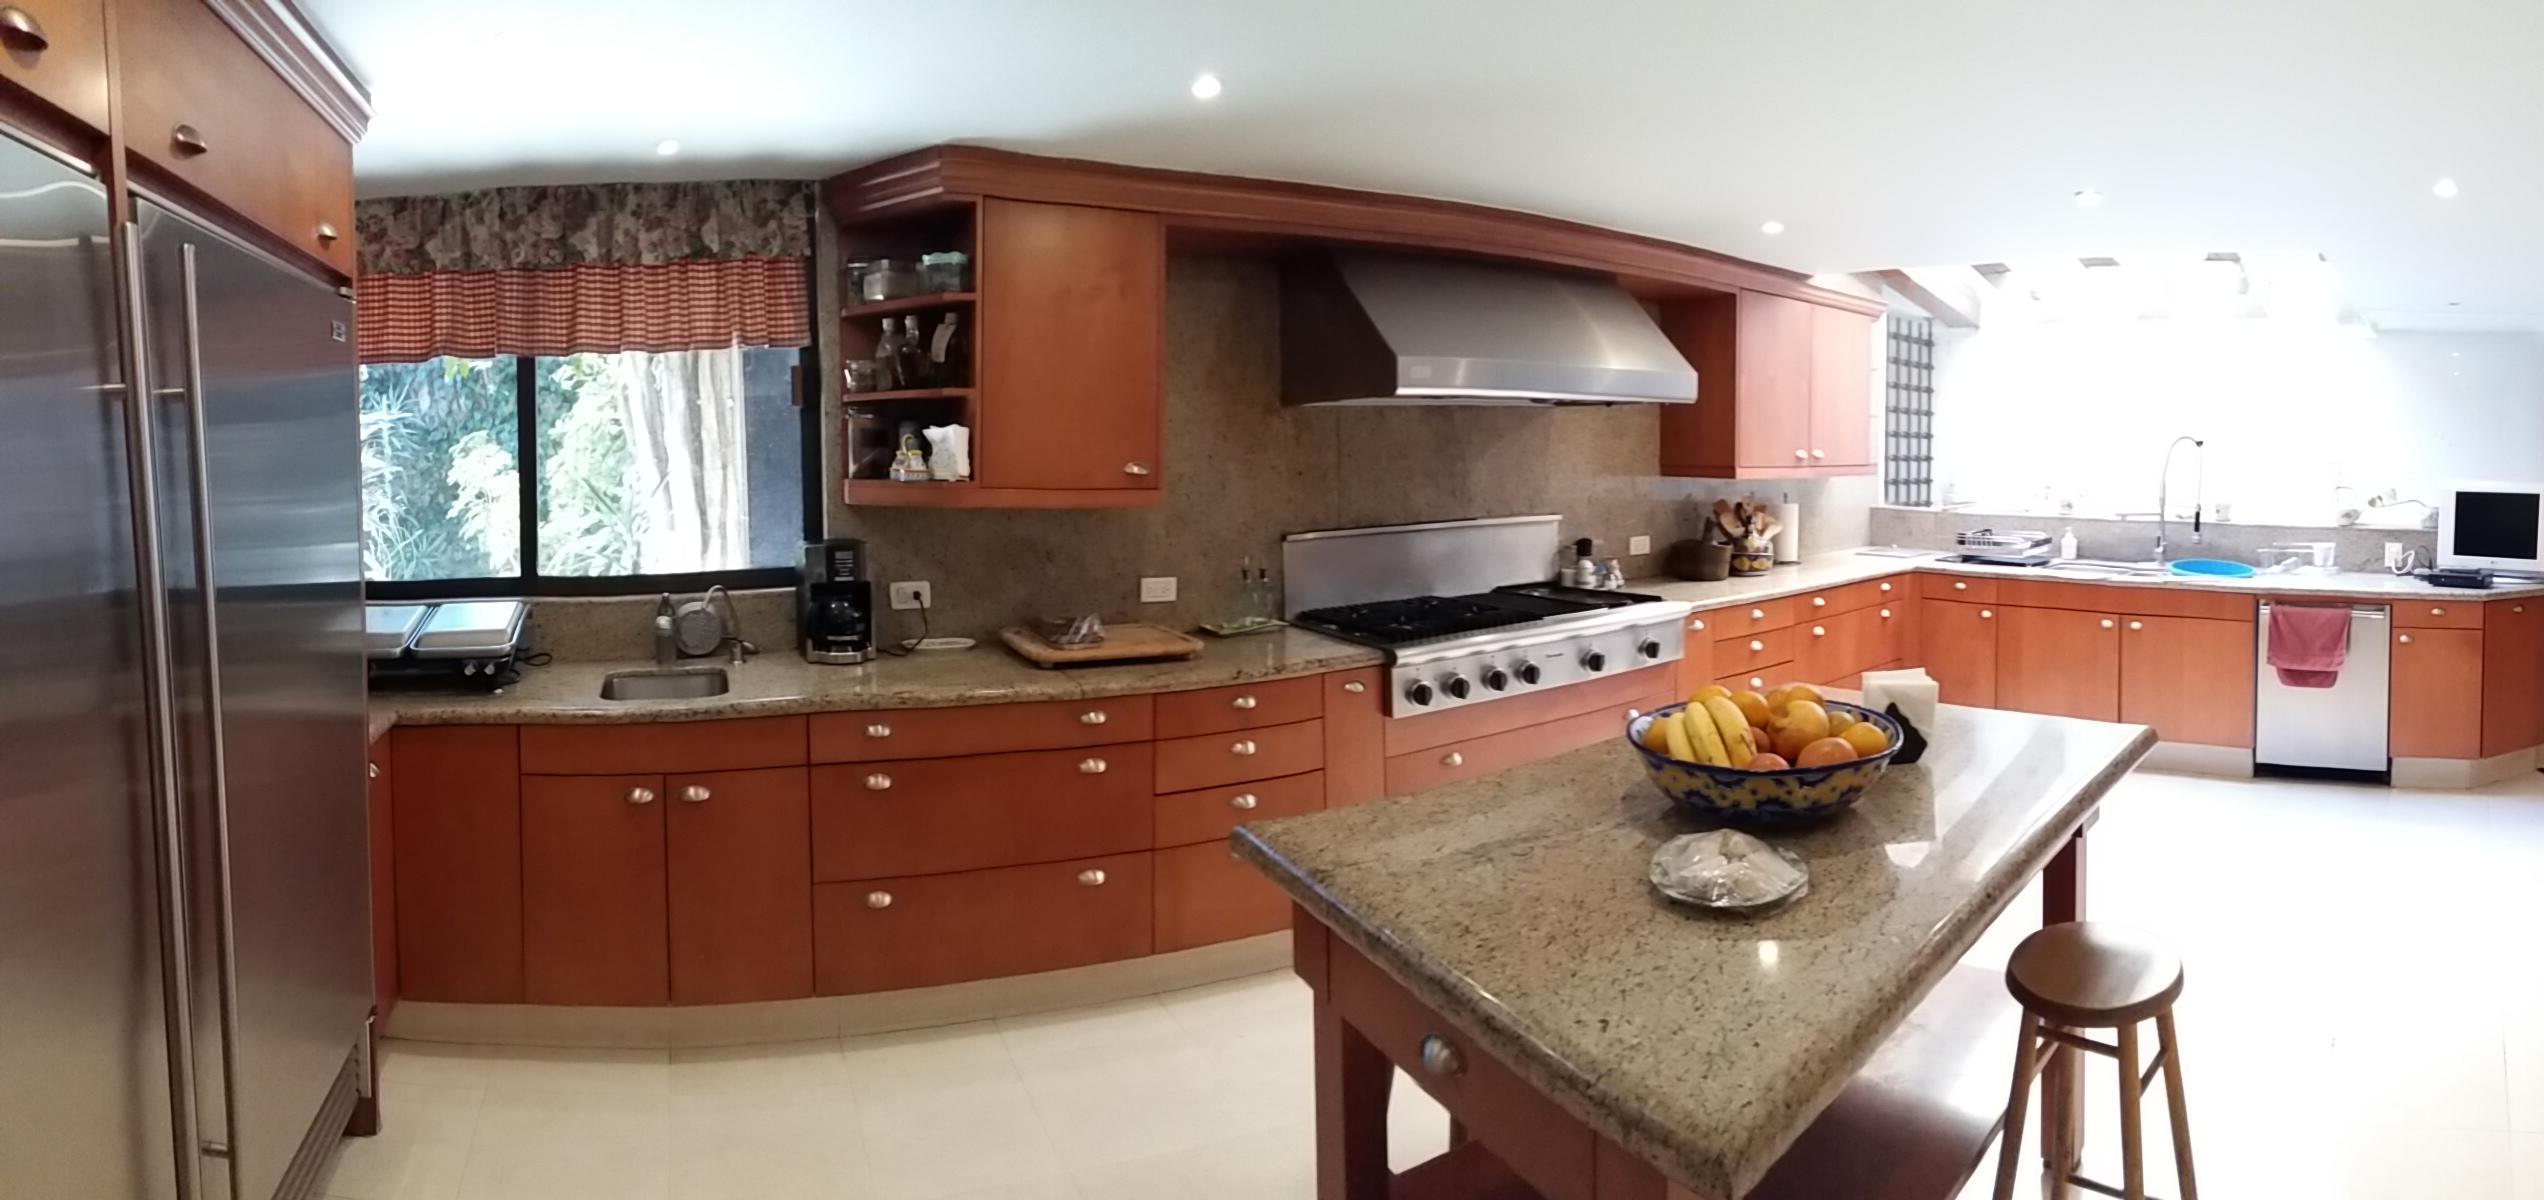 Casa en Venta Lomas de Tecamachalco Naucalpan de Jurez